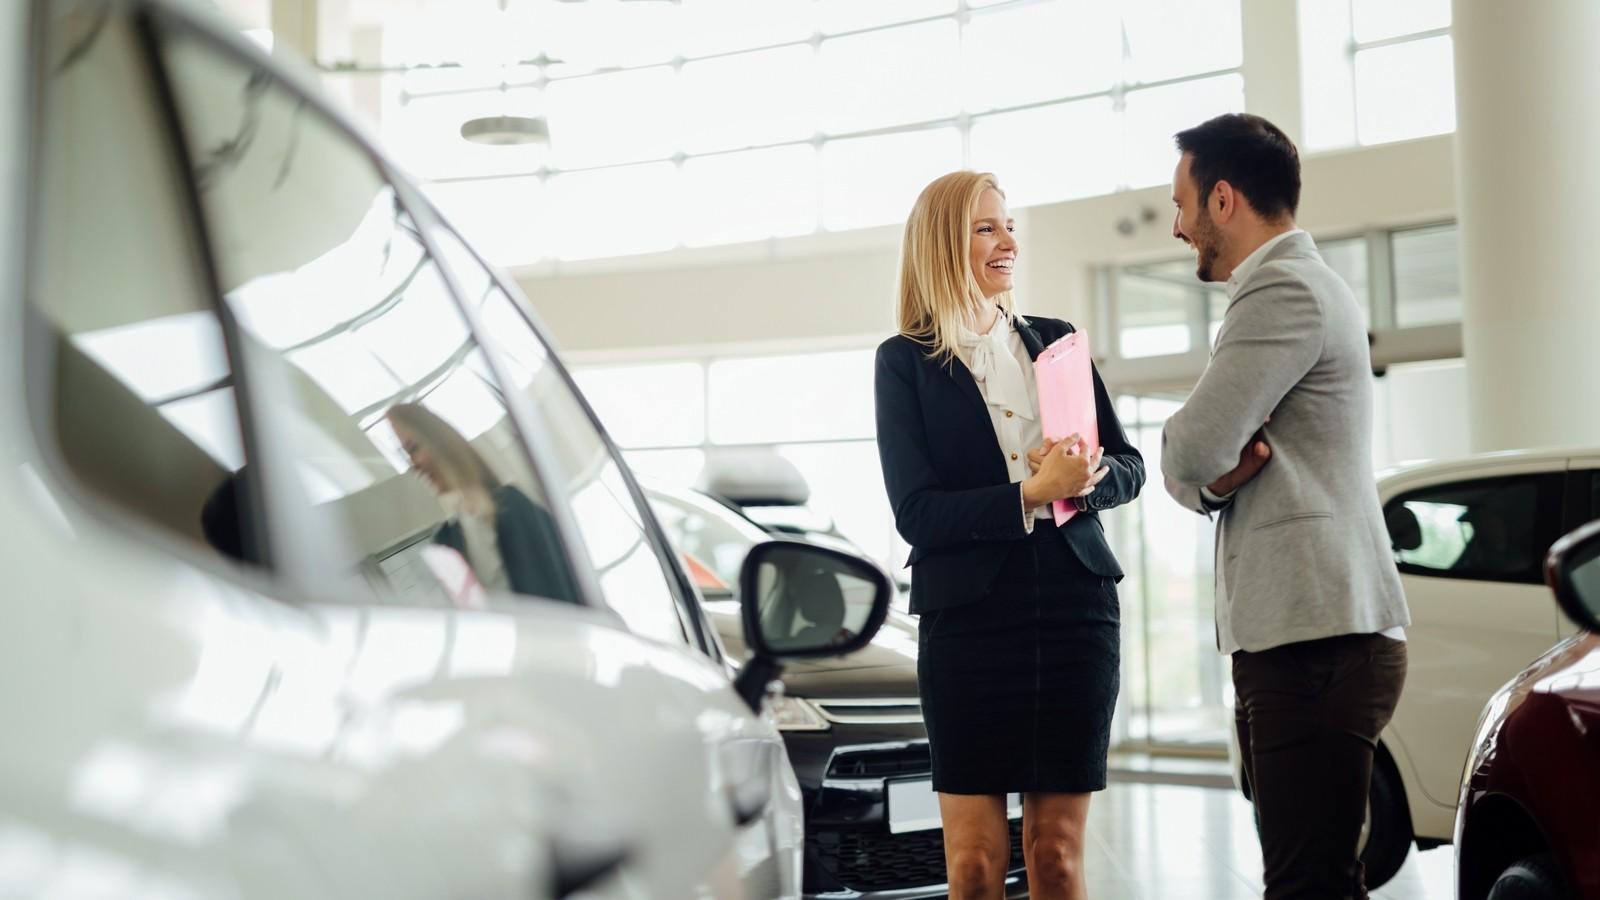 Salesperson selling cars at dealership